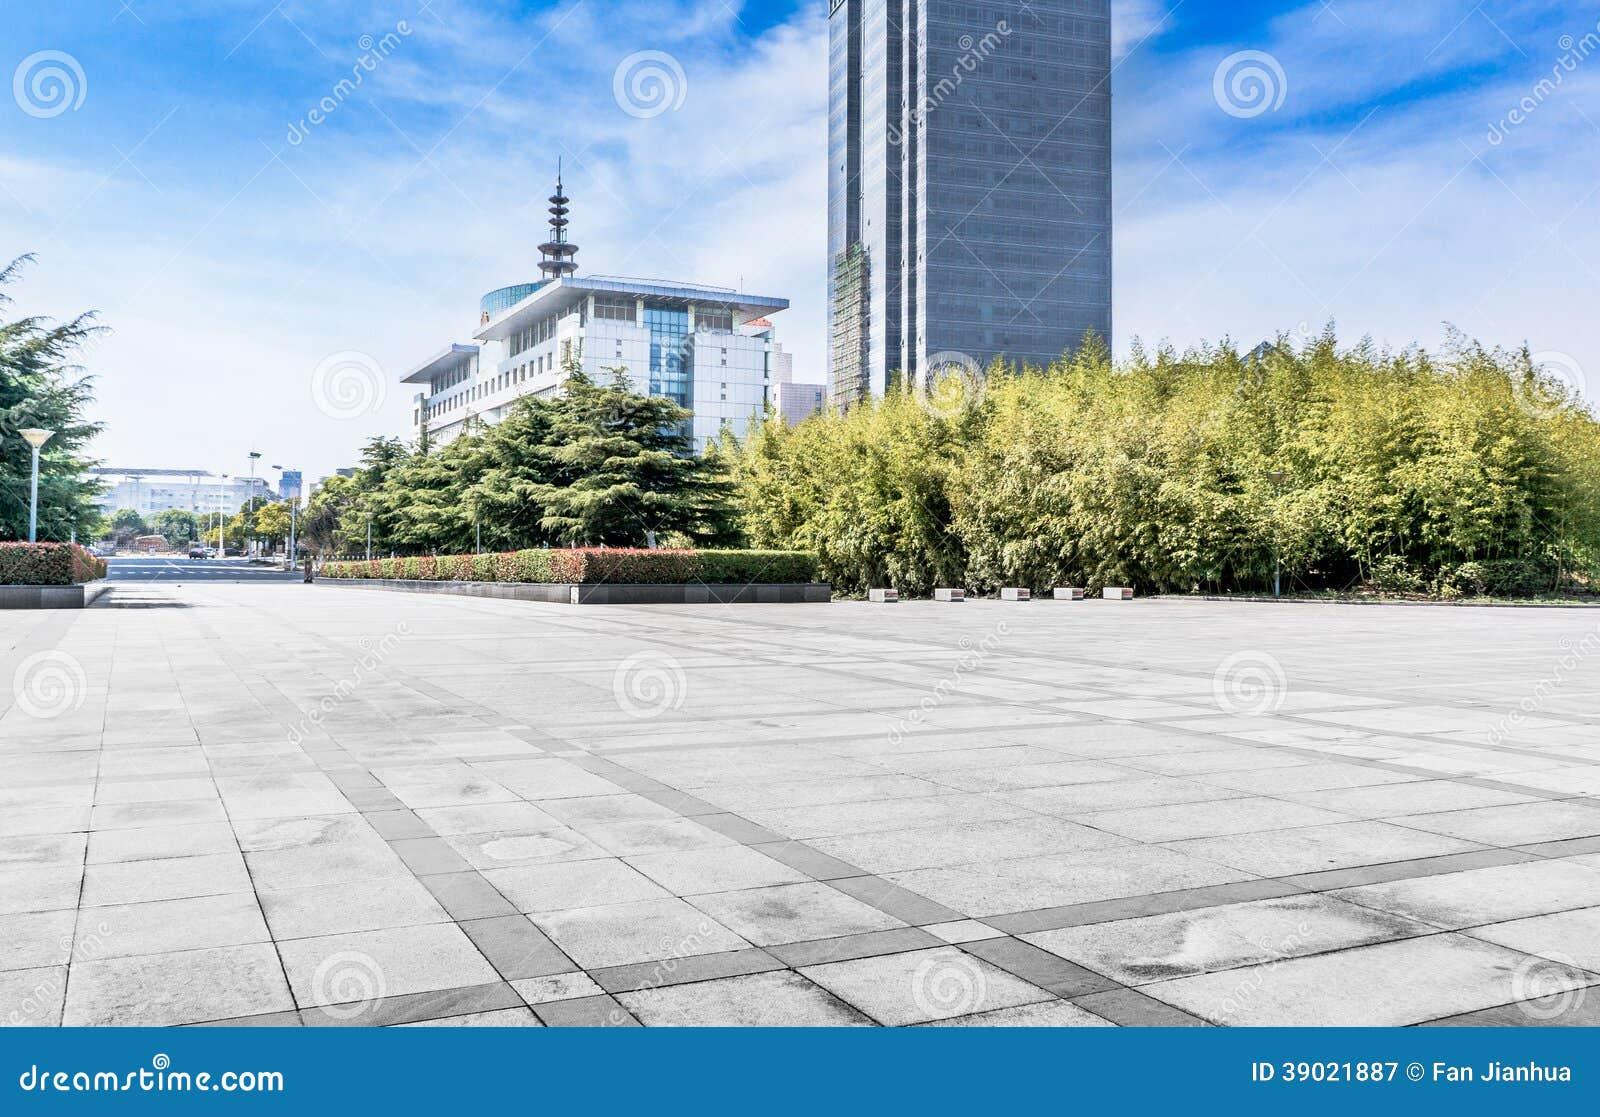 Jiangyin City Scenery Stock Image. Image Of Scenery